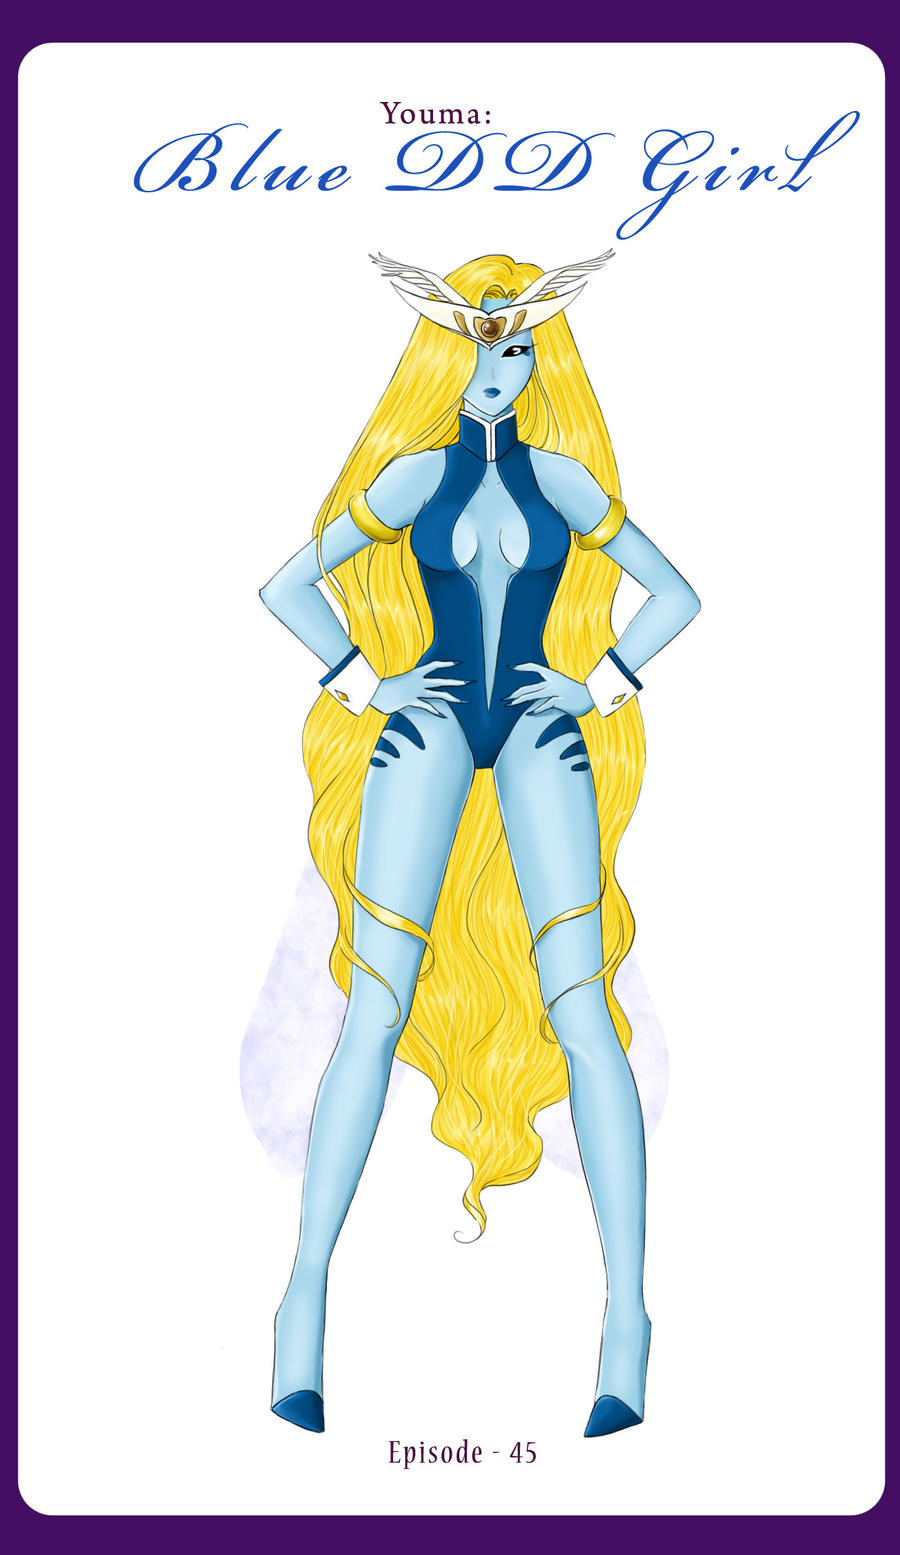 http://fc07.deviantart.net/fs33/i/2008/299/5/a/Page_48___Blue_DD_Girl_by_Dark_elfa.jpg